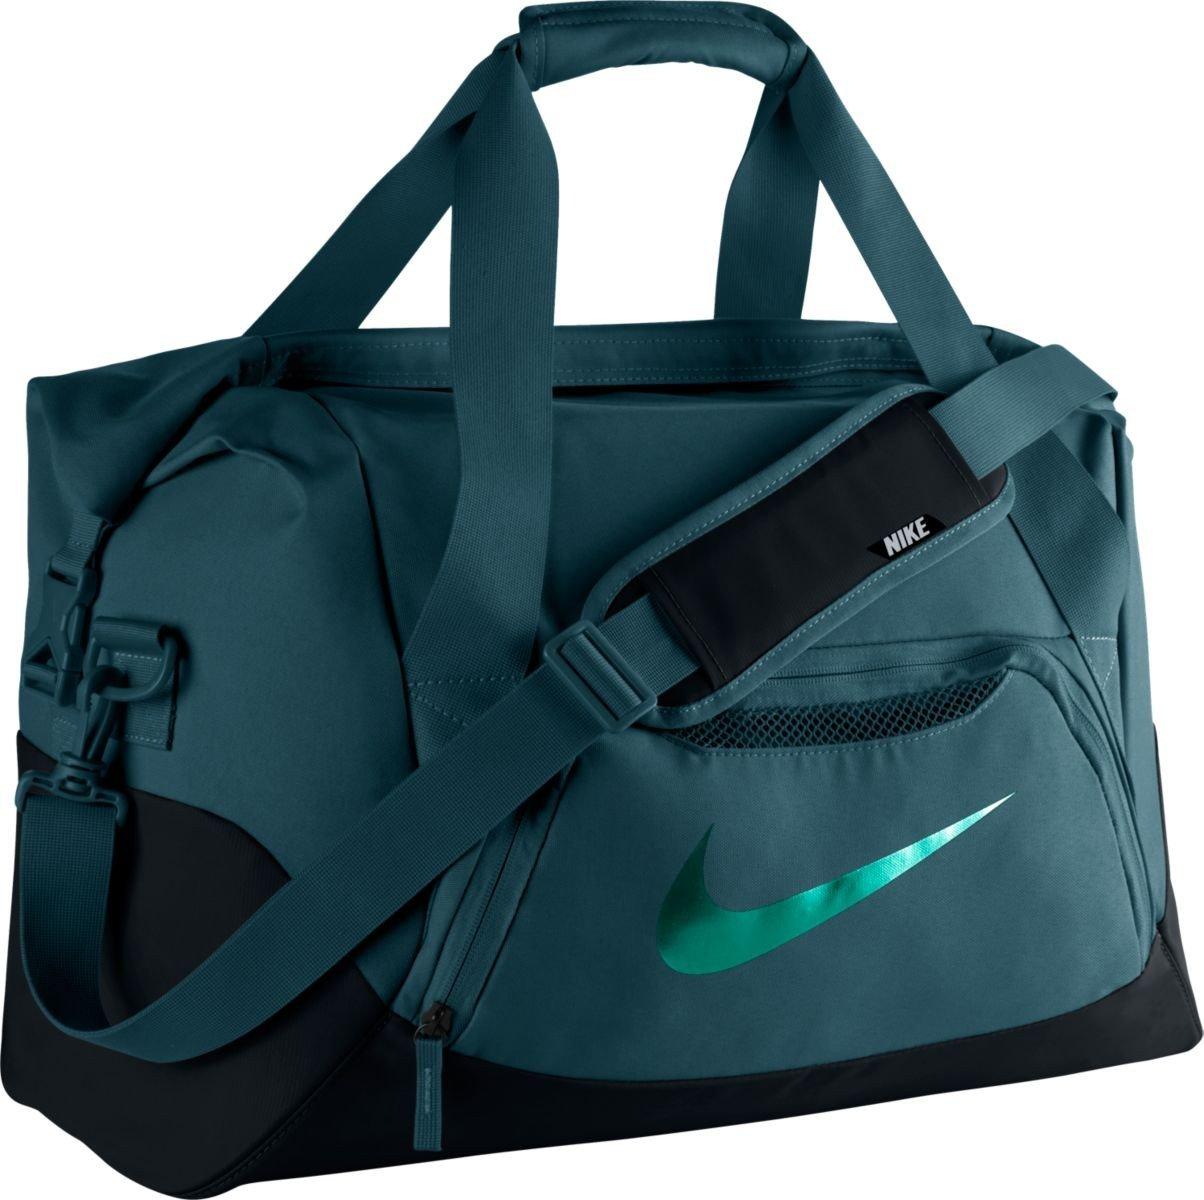 Nike FB SHIELD DUFFEL Bag a731fb5104874